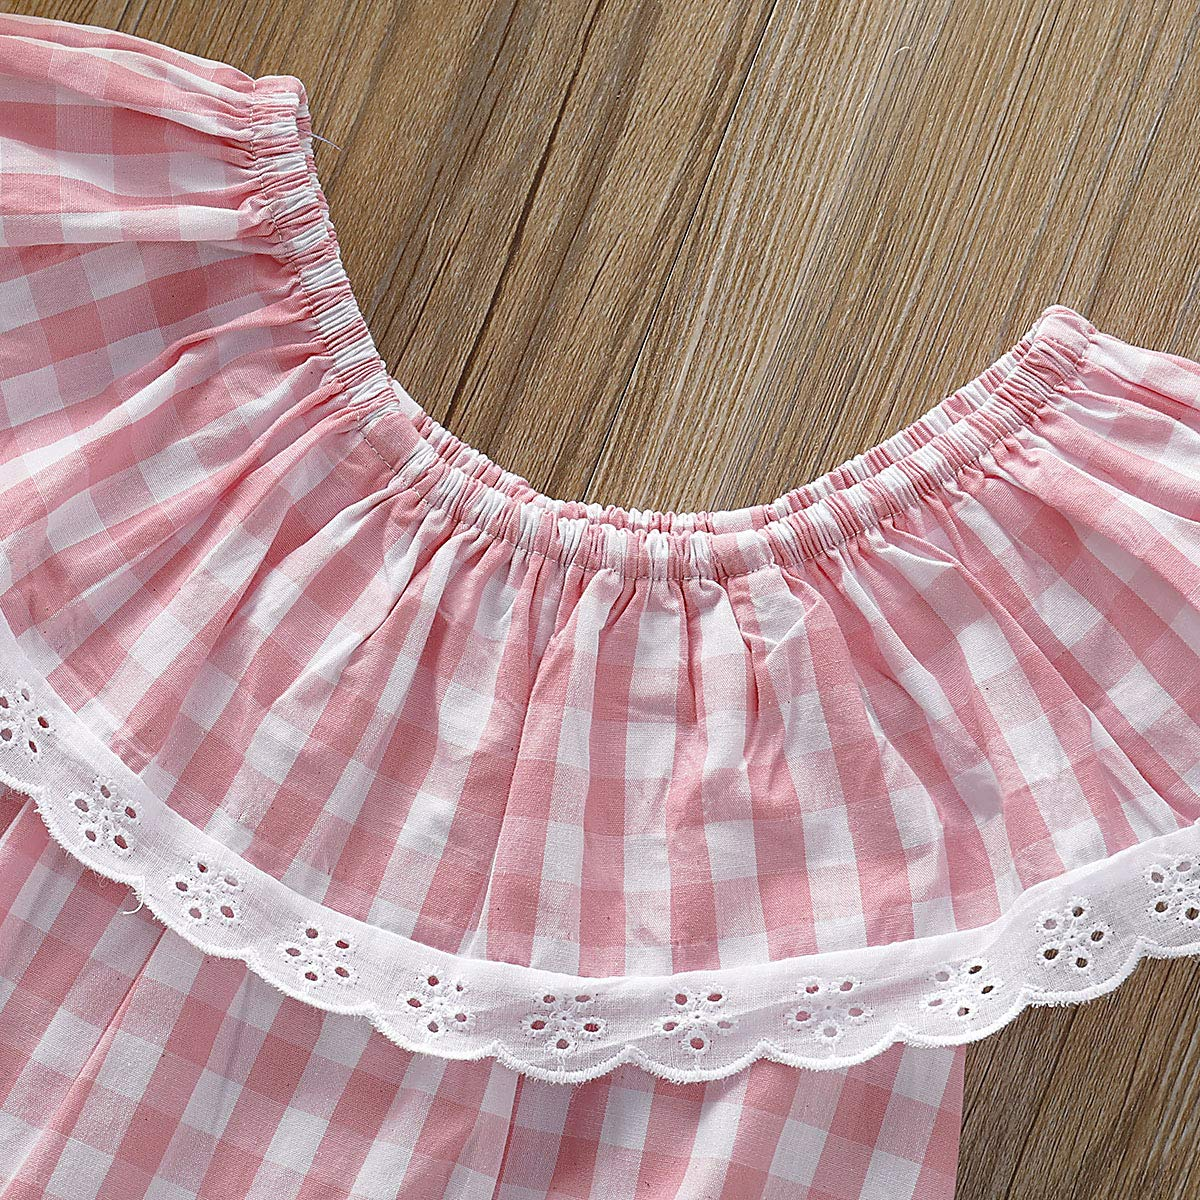 2019 Summer Infant Baby Girls Lace Ruffled Sleeveless Plaid Romper Pink Fresh Style Jumpsuit